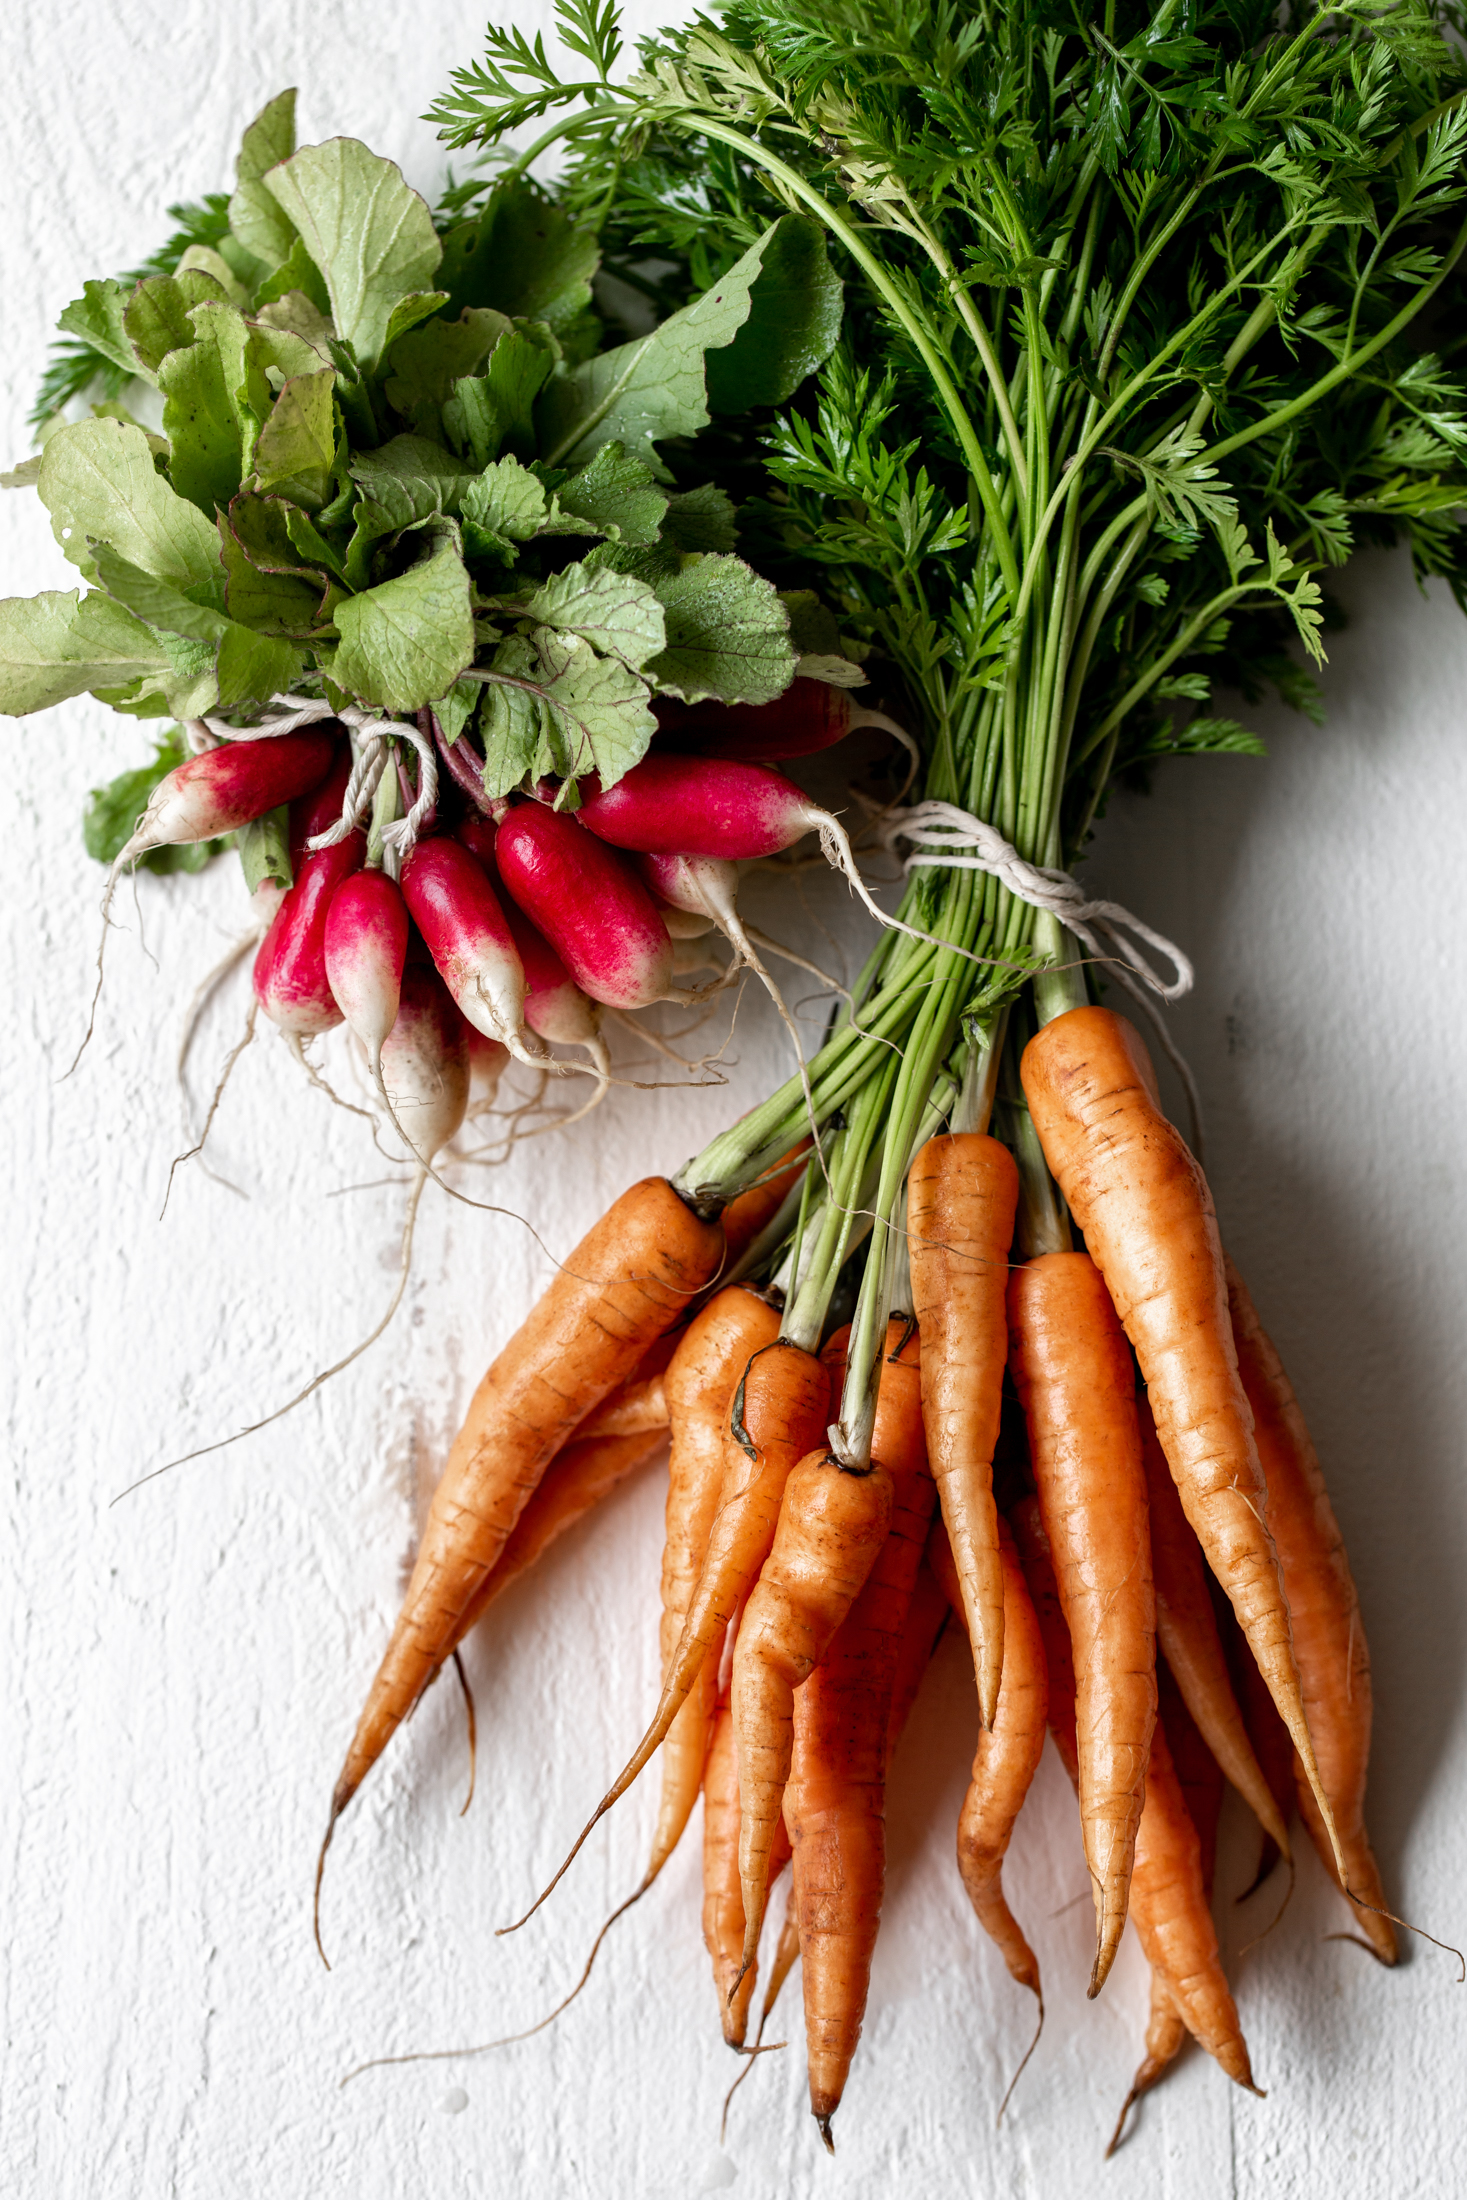 spring vegetables ingredient shot radish and carrots